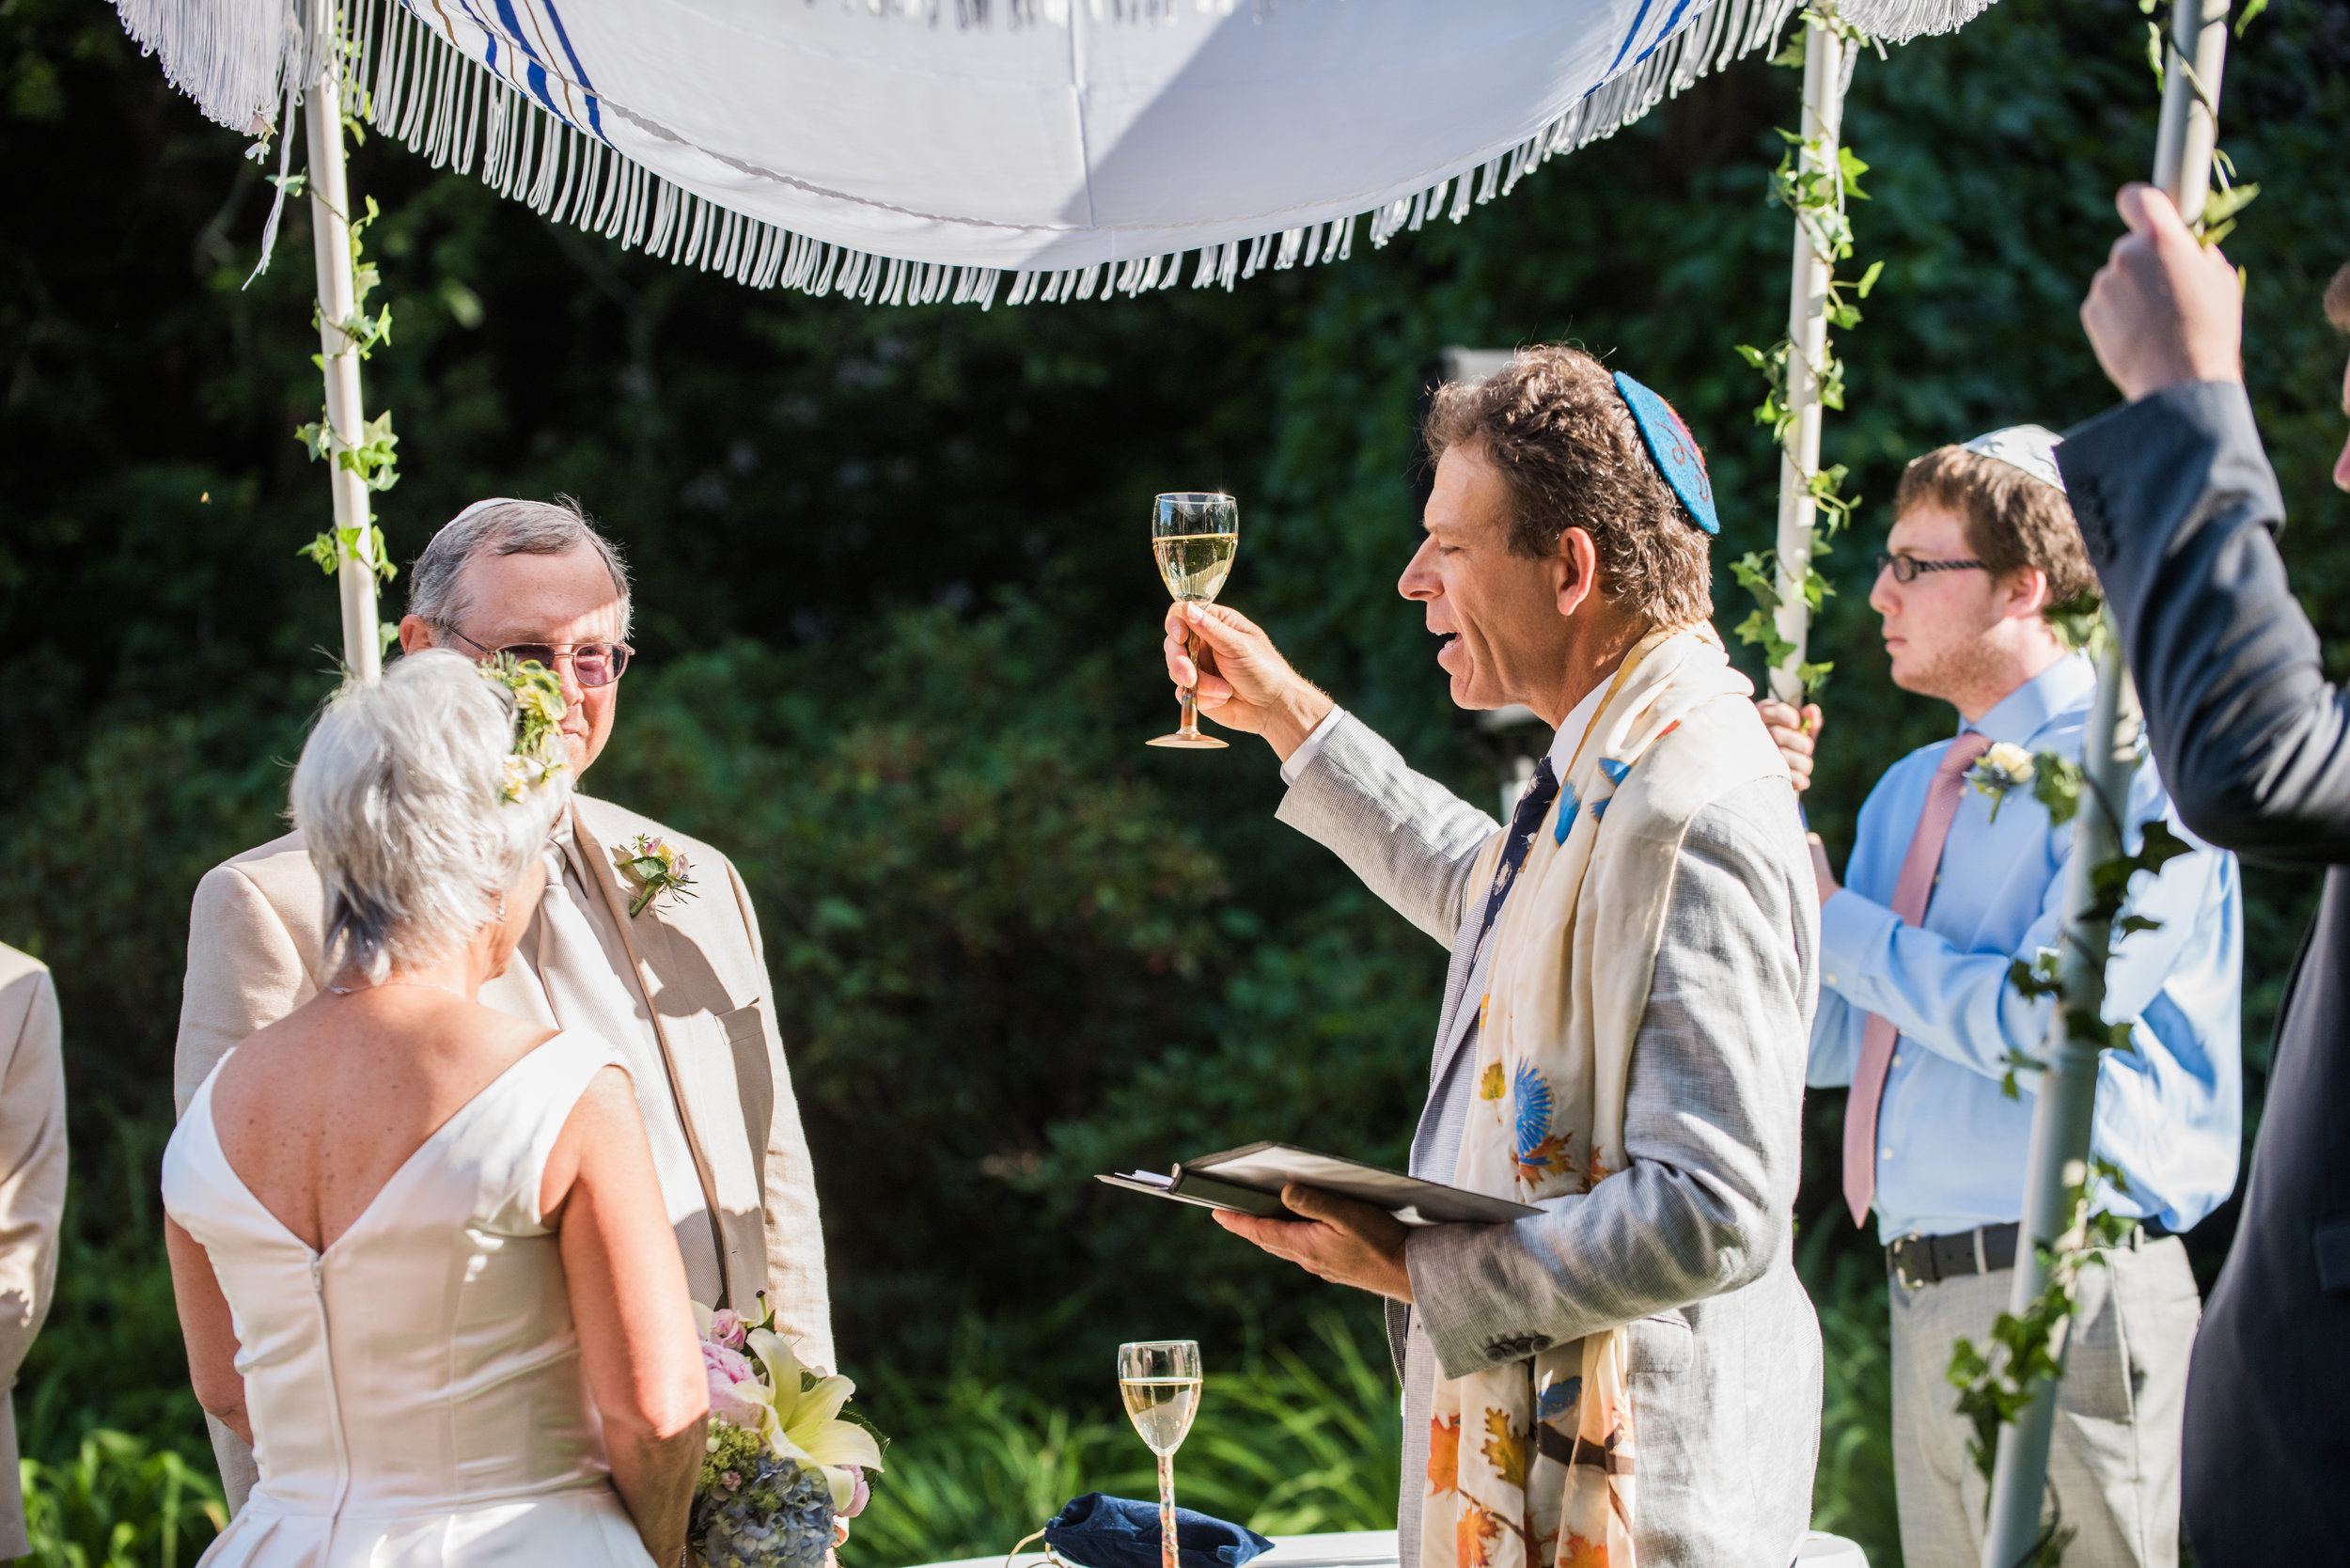 Sherri Wedding Under the Chuppah with Wine Glass.jpg